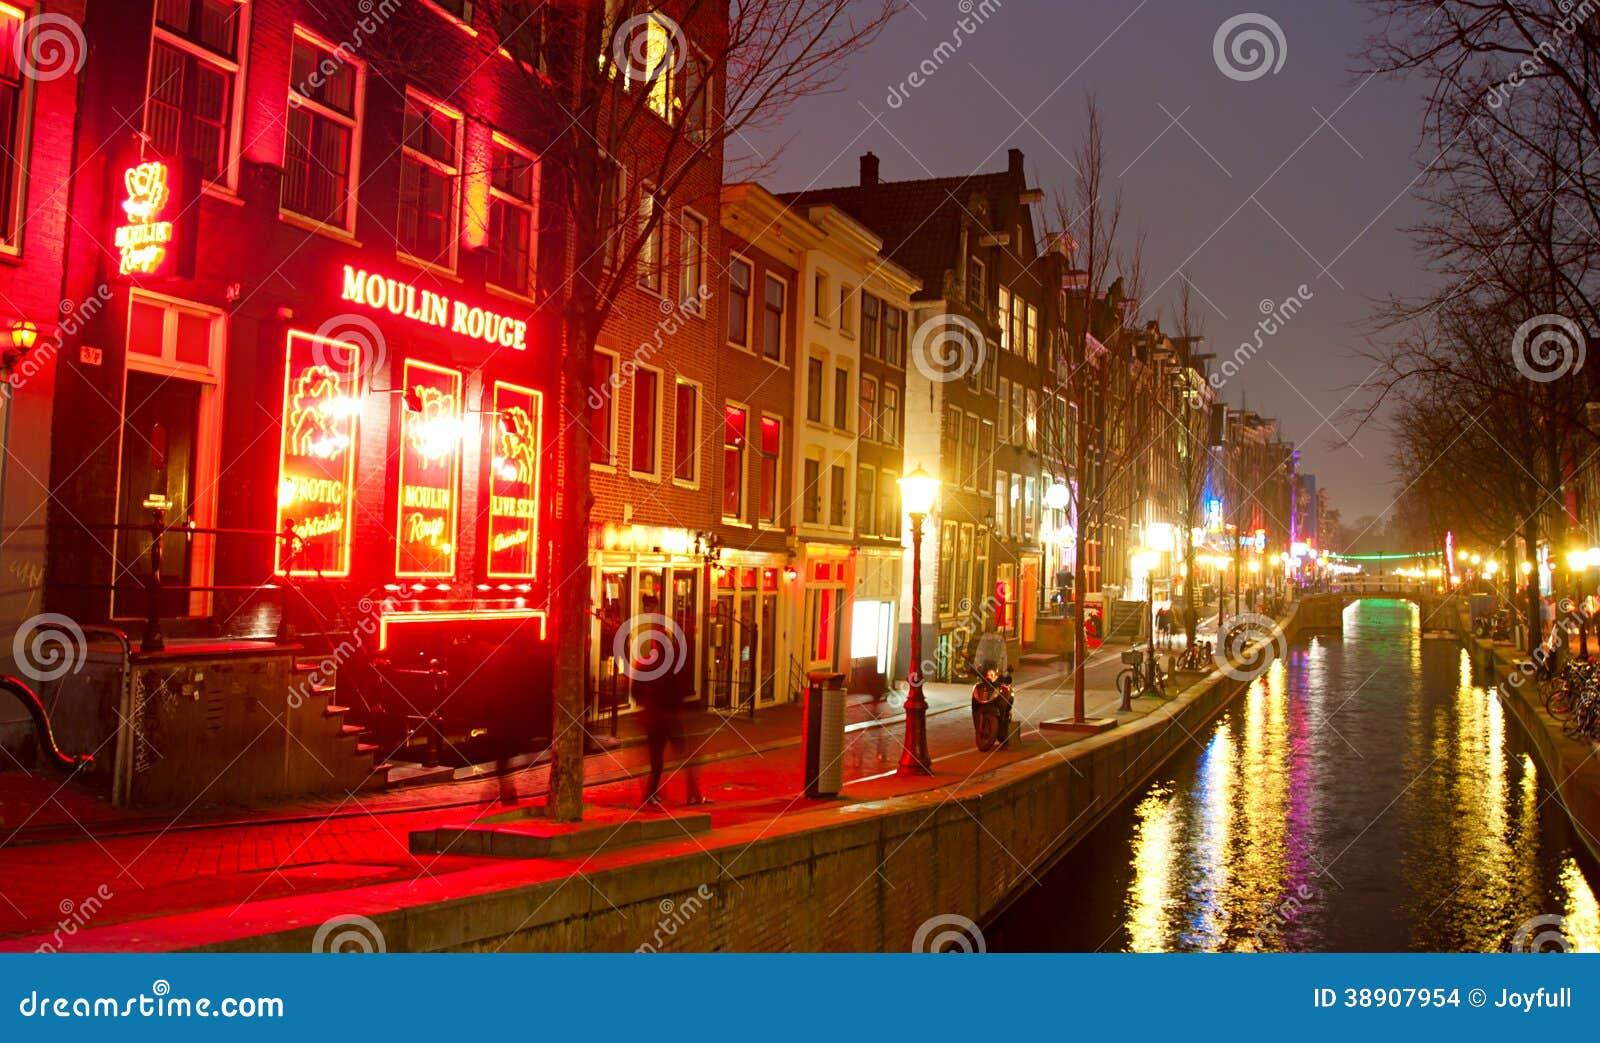 Rotlichtviertel Amsterdam redaktionelles stockbild. Bild